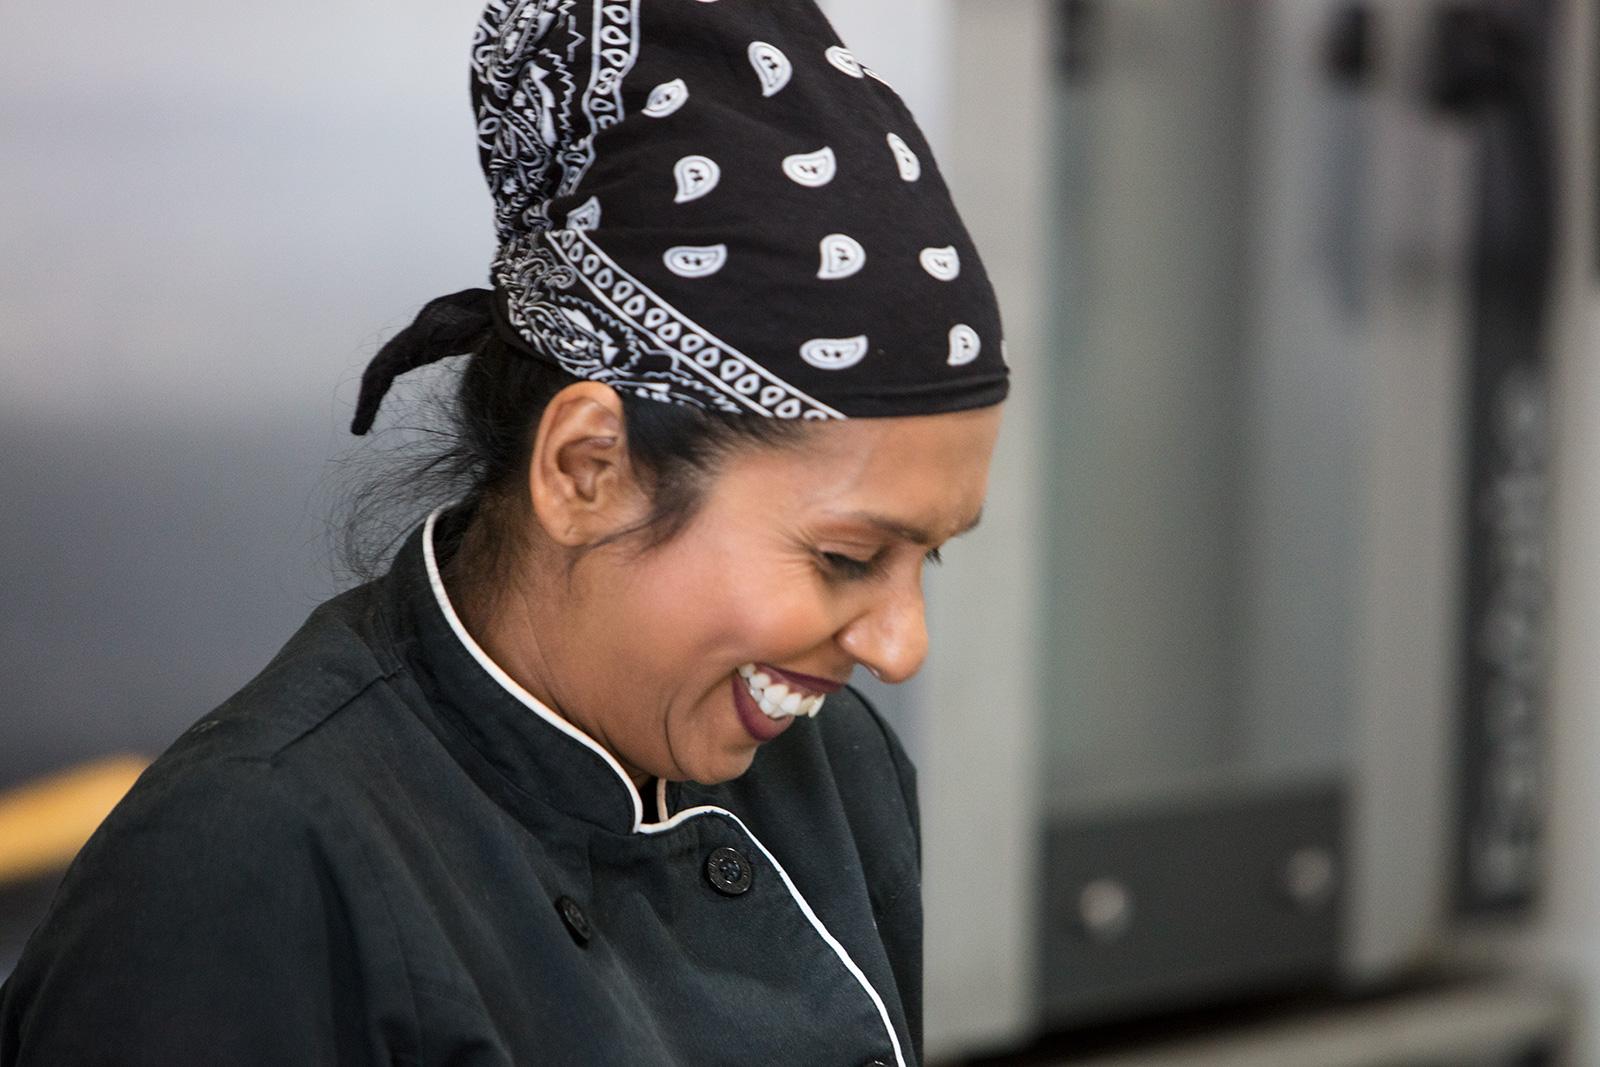 Dee, the happy chef!